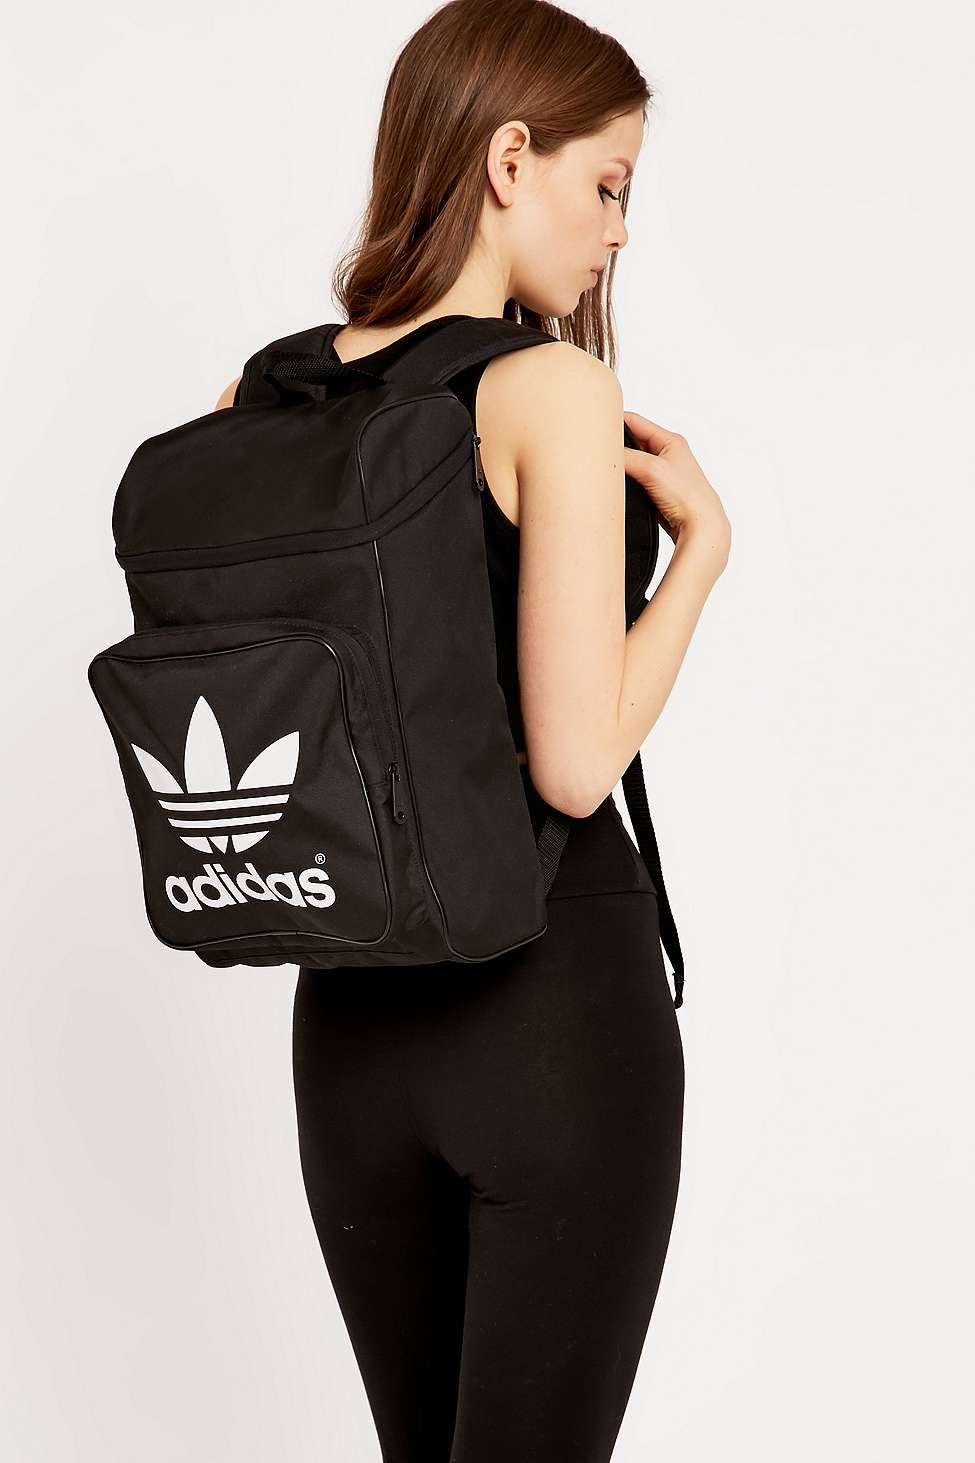 adidas Originals Classic Backpack in Black - Lyst 22285fcc137d4